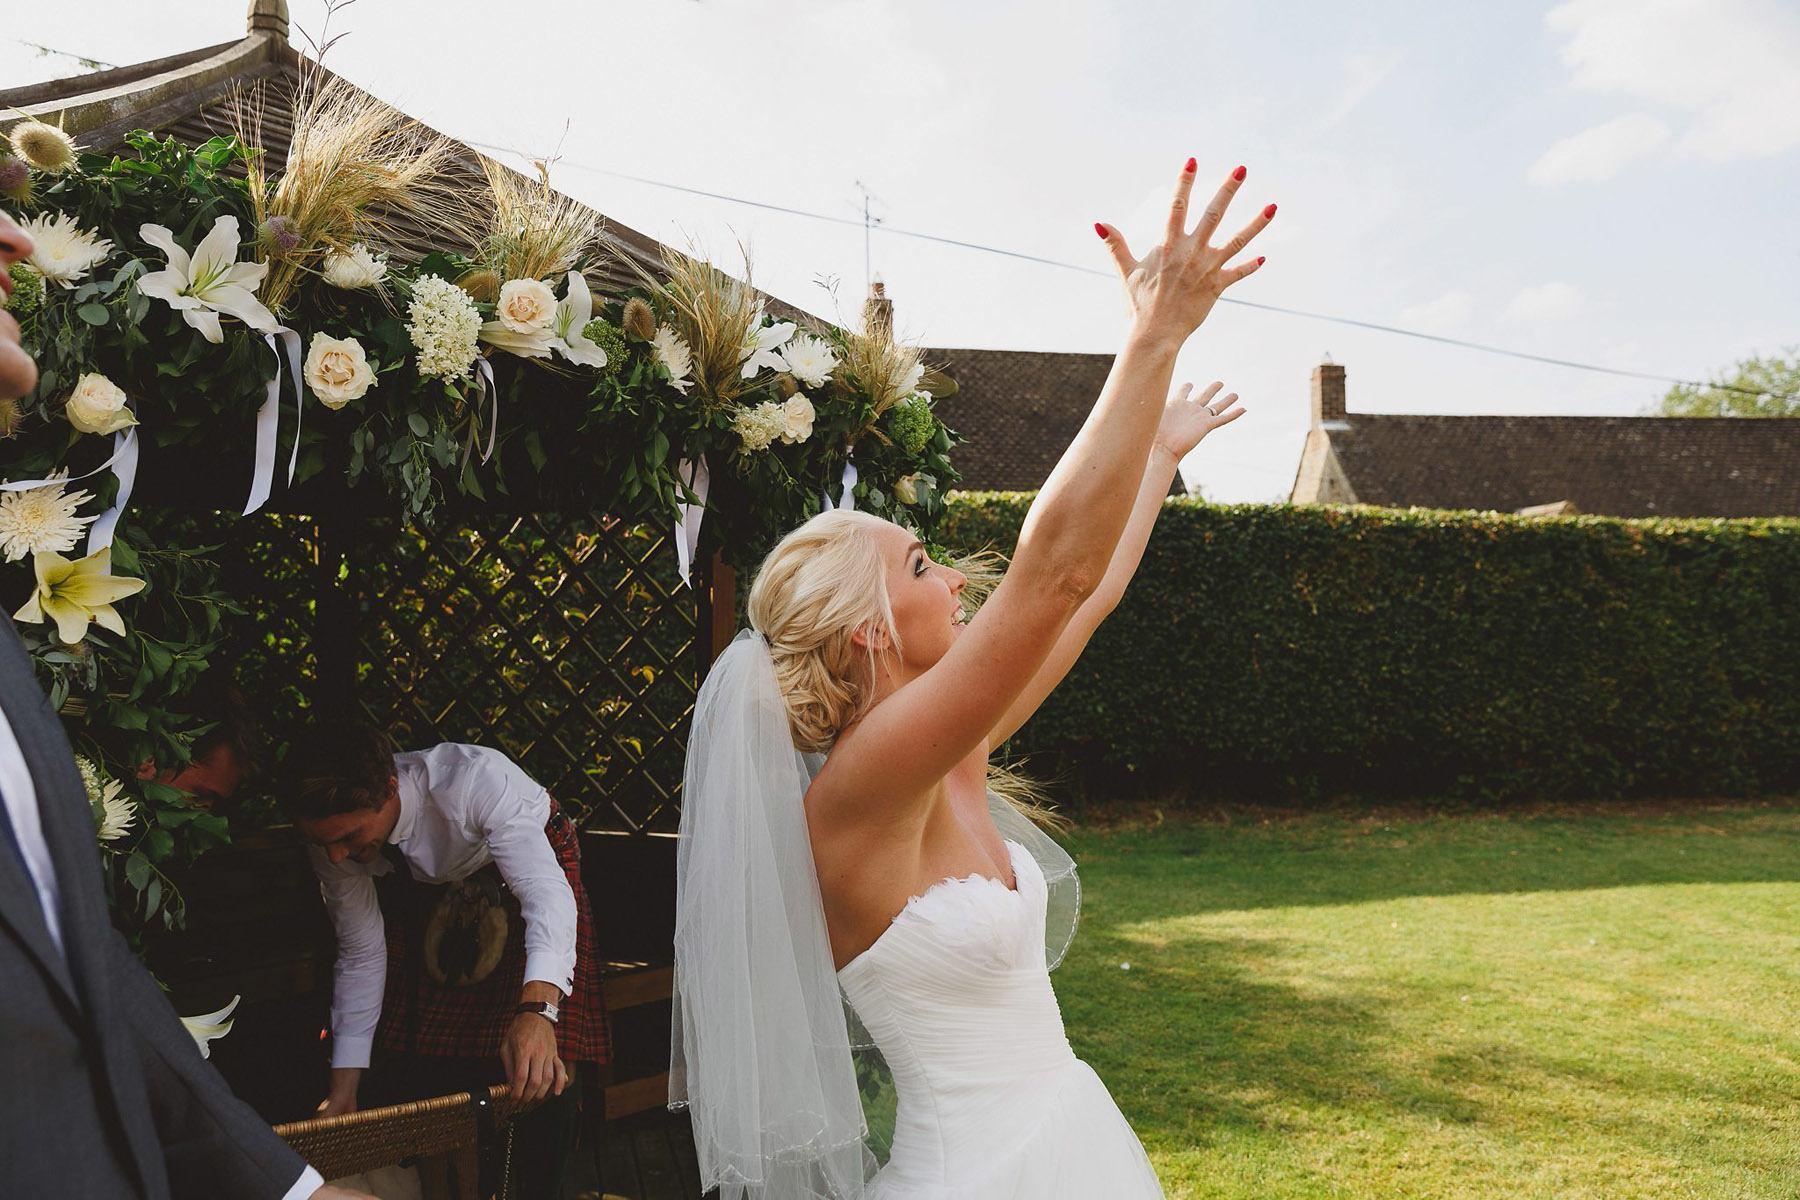 oxfordshire-wedding-photographer-044